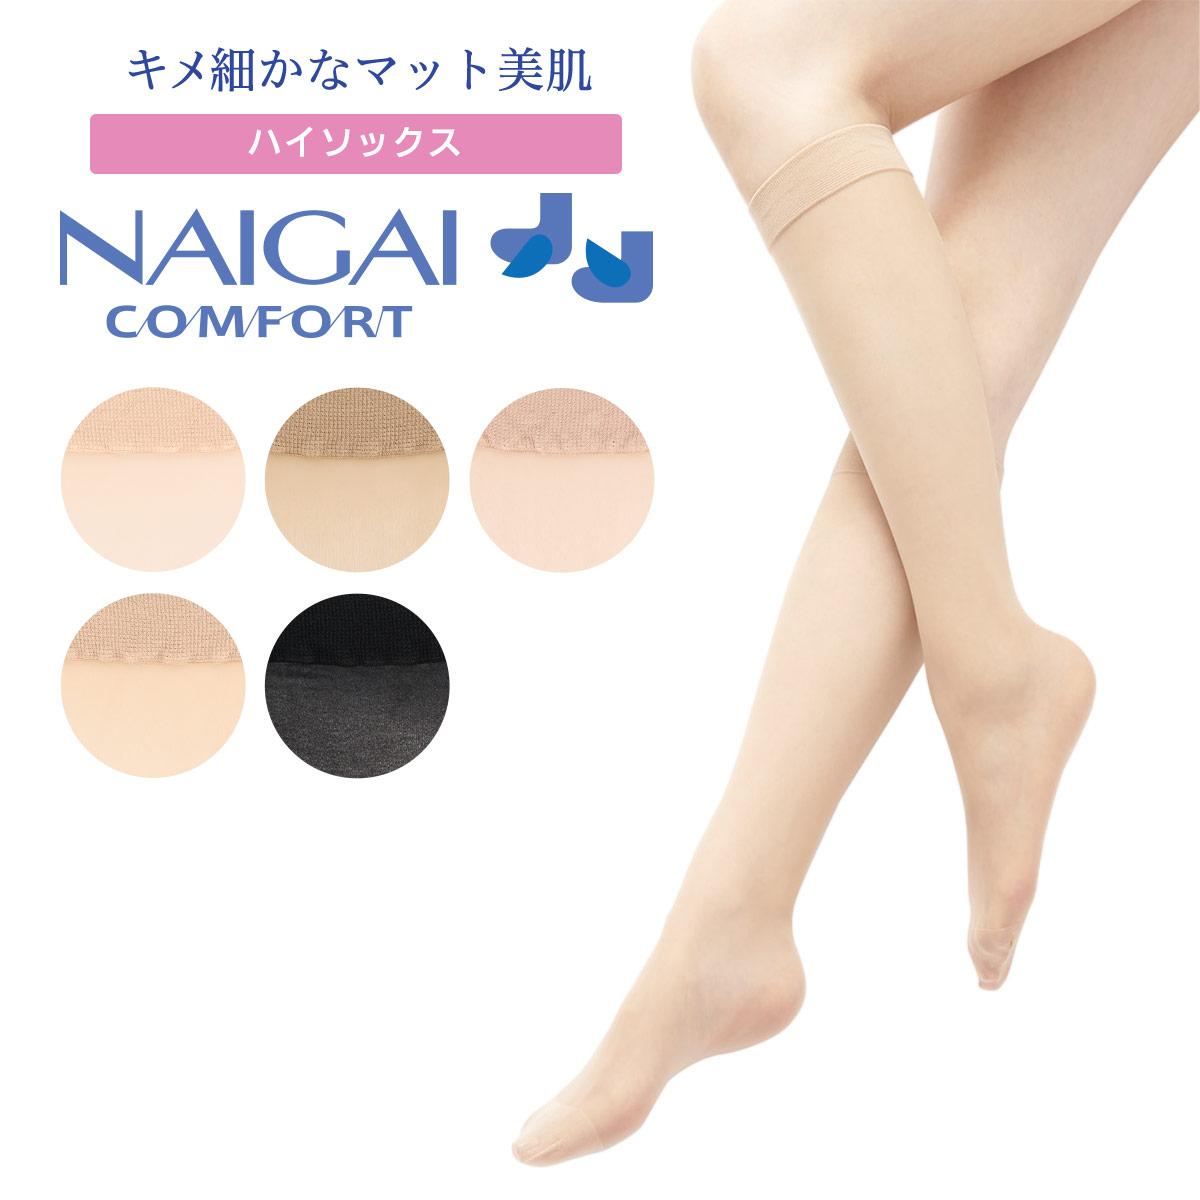 NAIGAI COMFORT ナイガイ コンフォート レディース ハイソックス 履き口ゆったり リラックス ストッキング靴下 パンストソックス 1005007【ゆうパケット・6点まで】